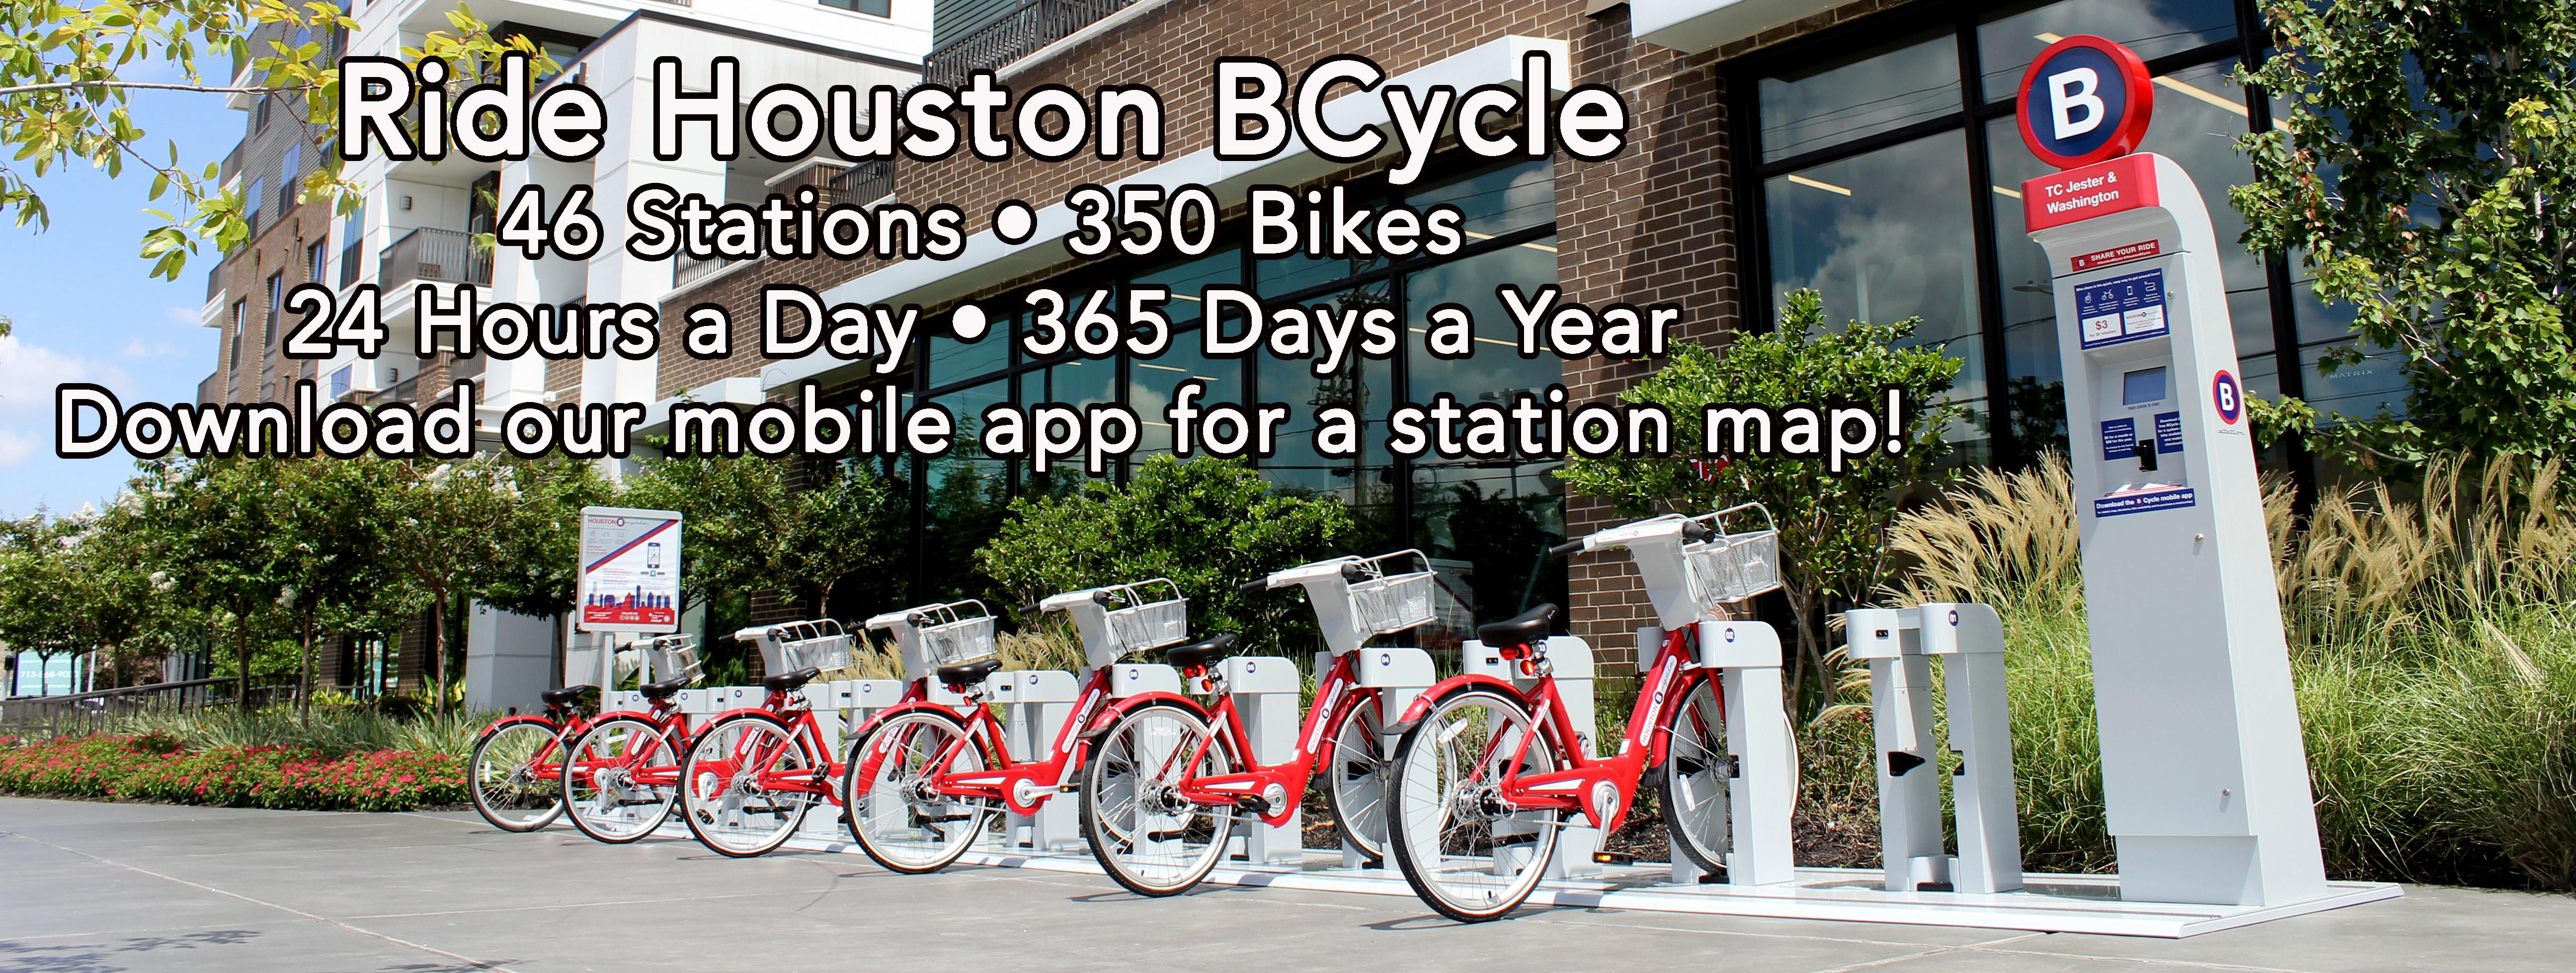 Houston BCycle  Bike Share in Houston